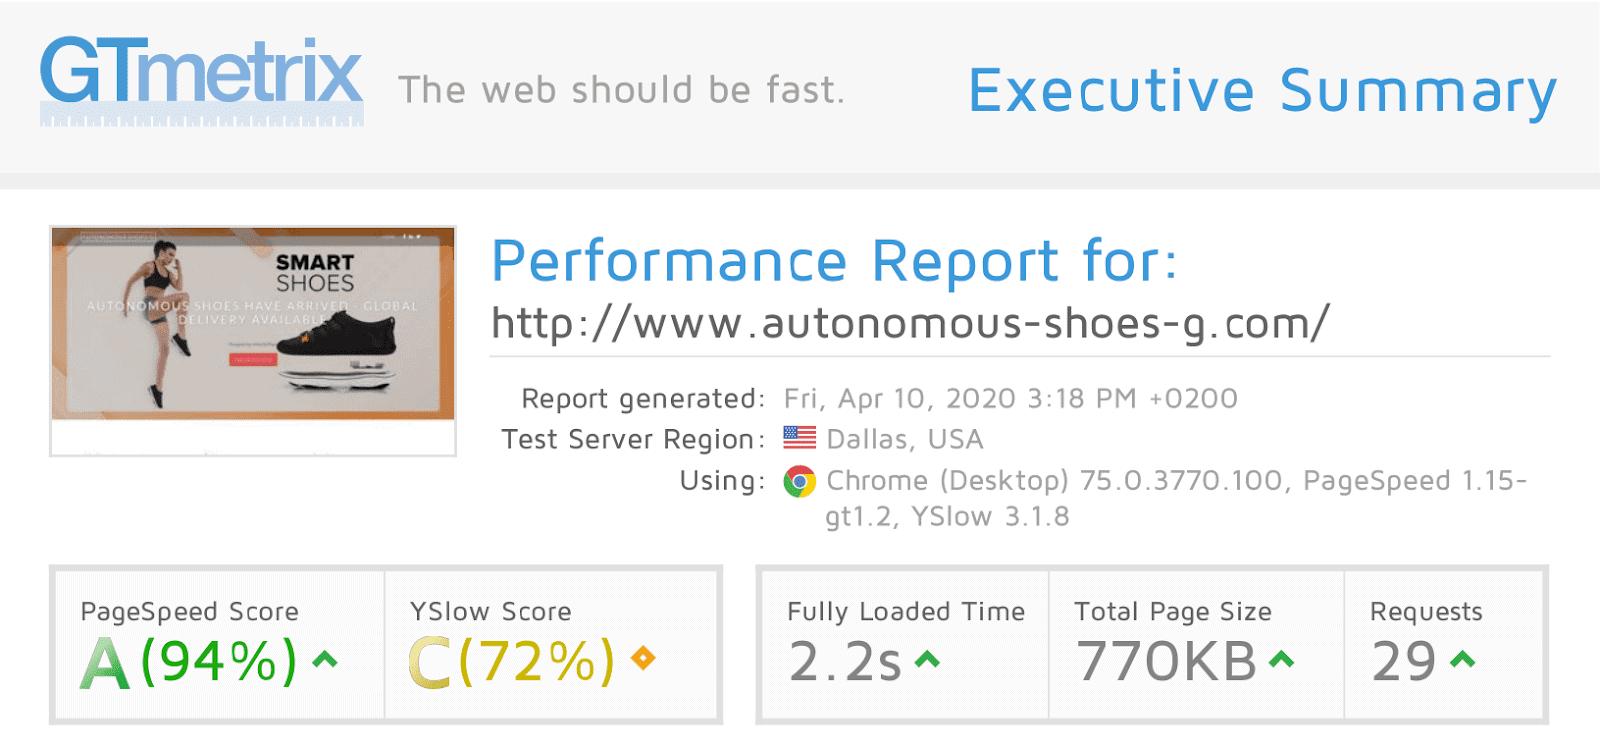 GoDaddy GTmetrix test results